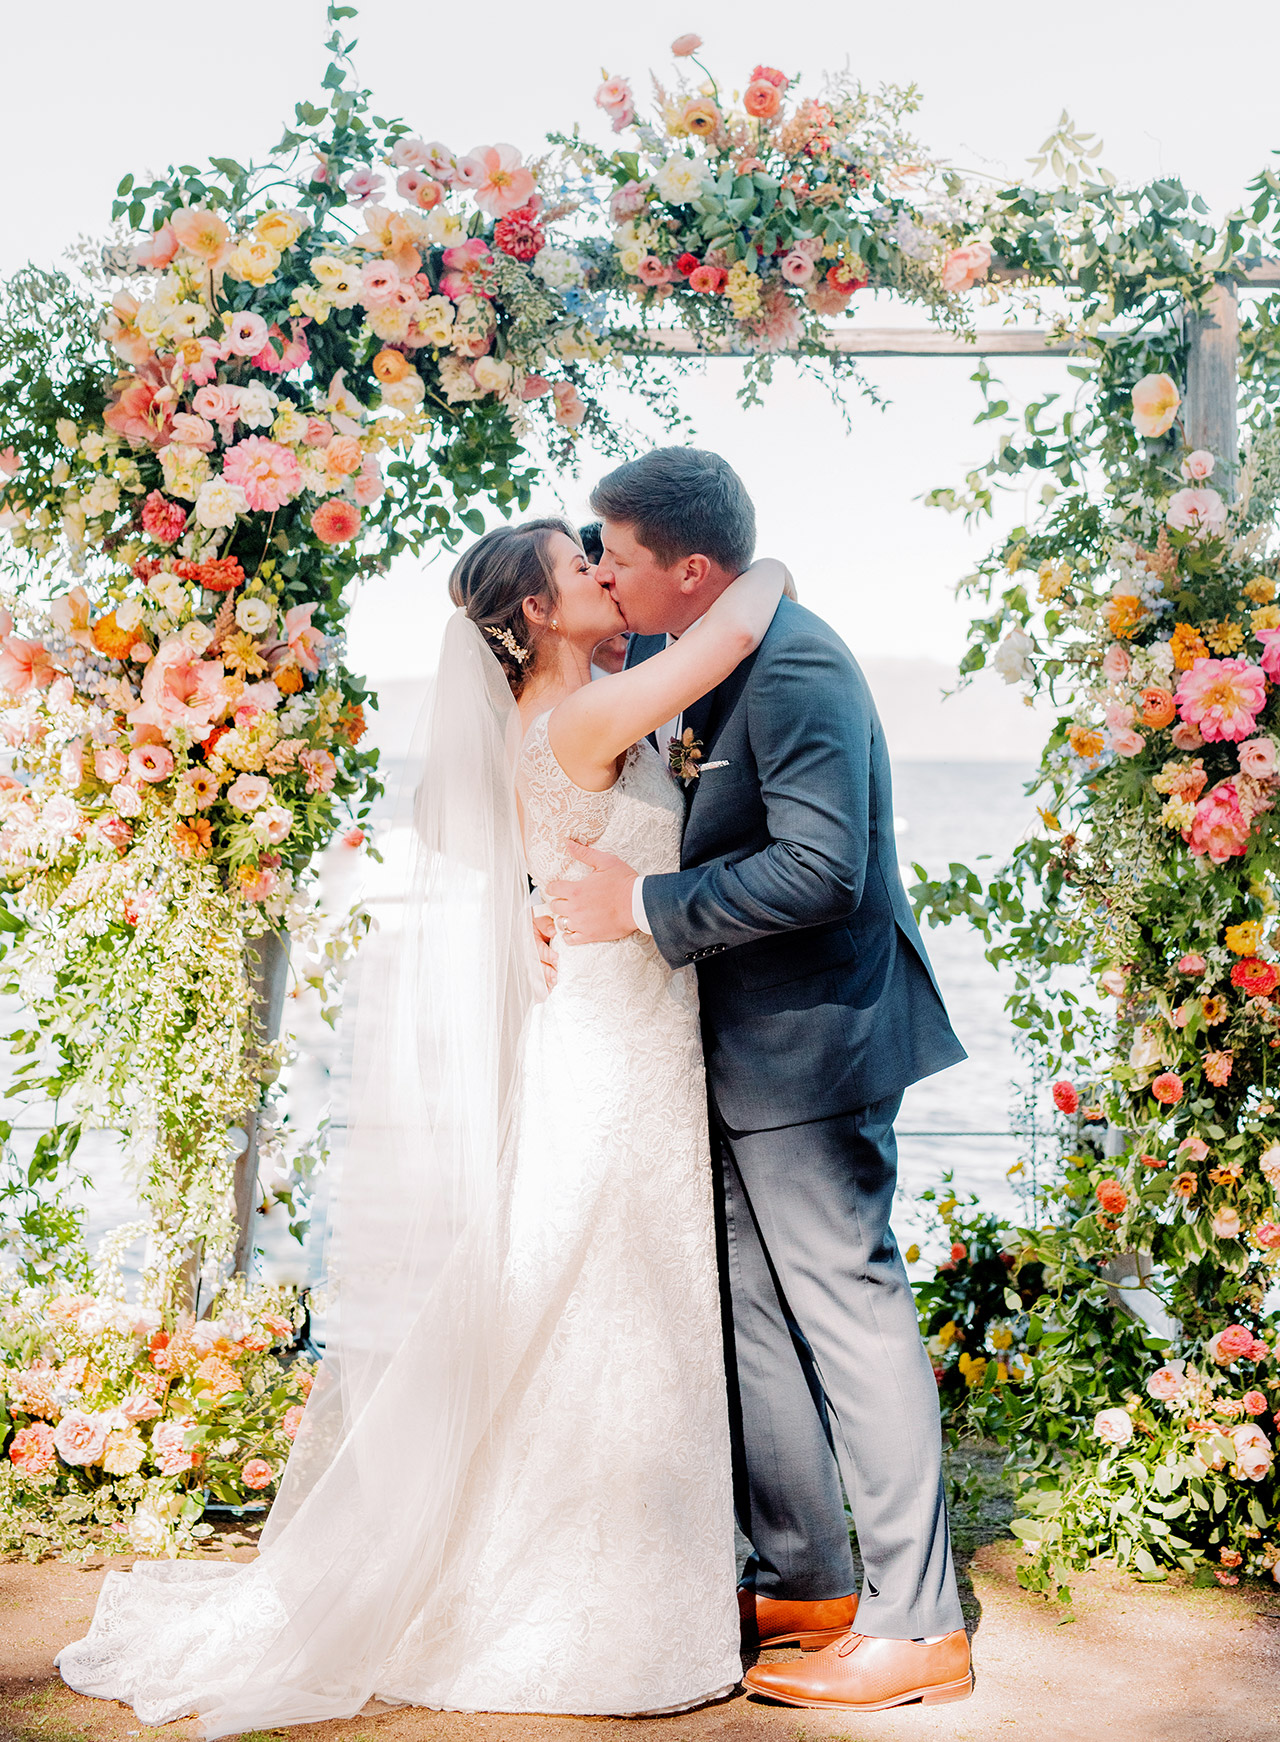 bride groom wedding kiss lake view under arch